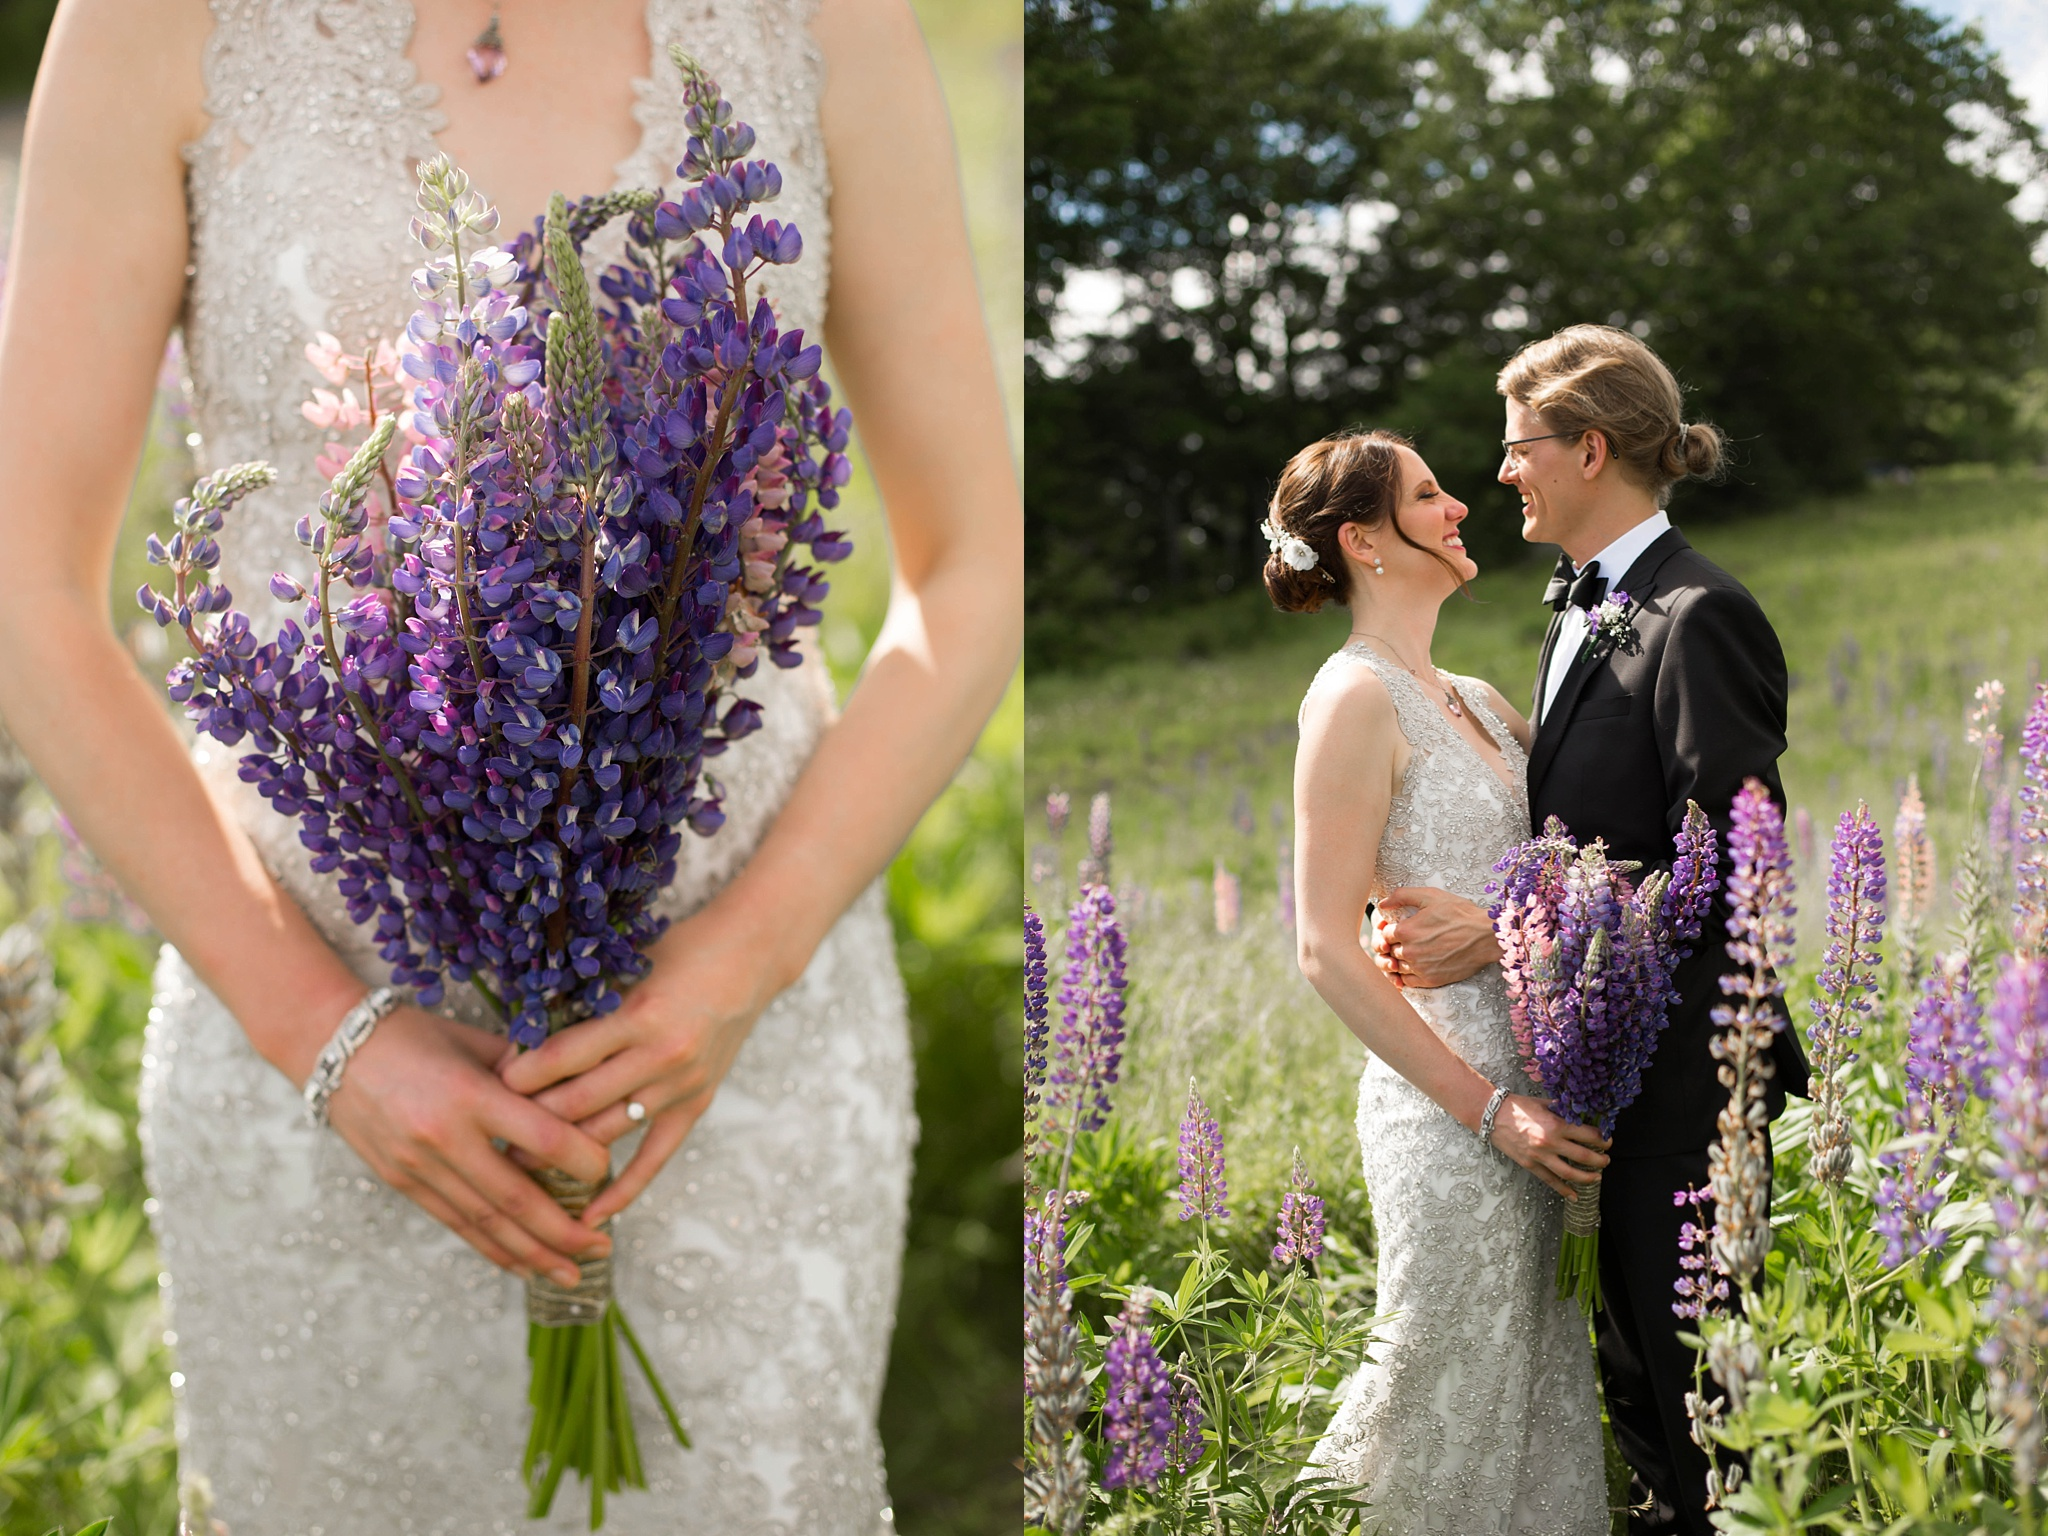 lupine wedding flowers